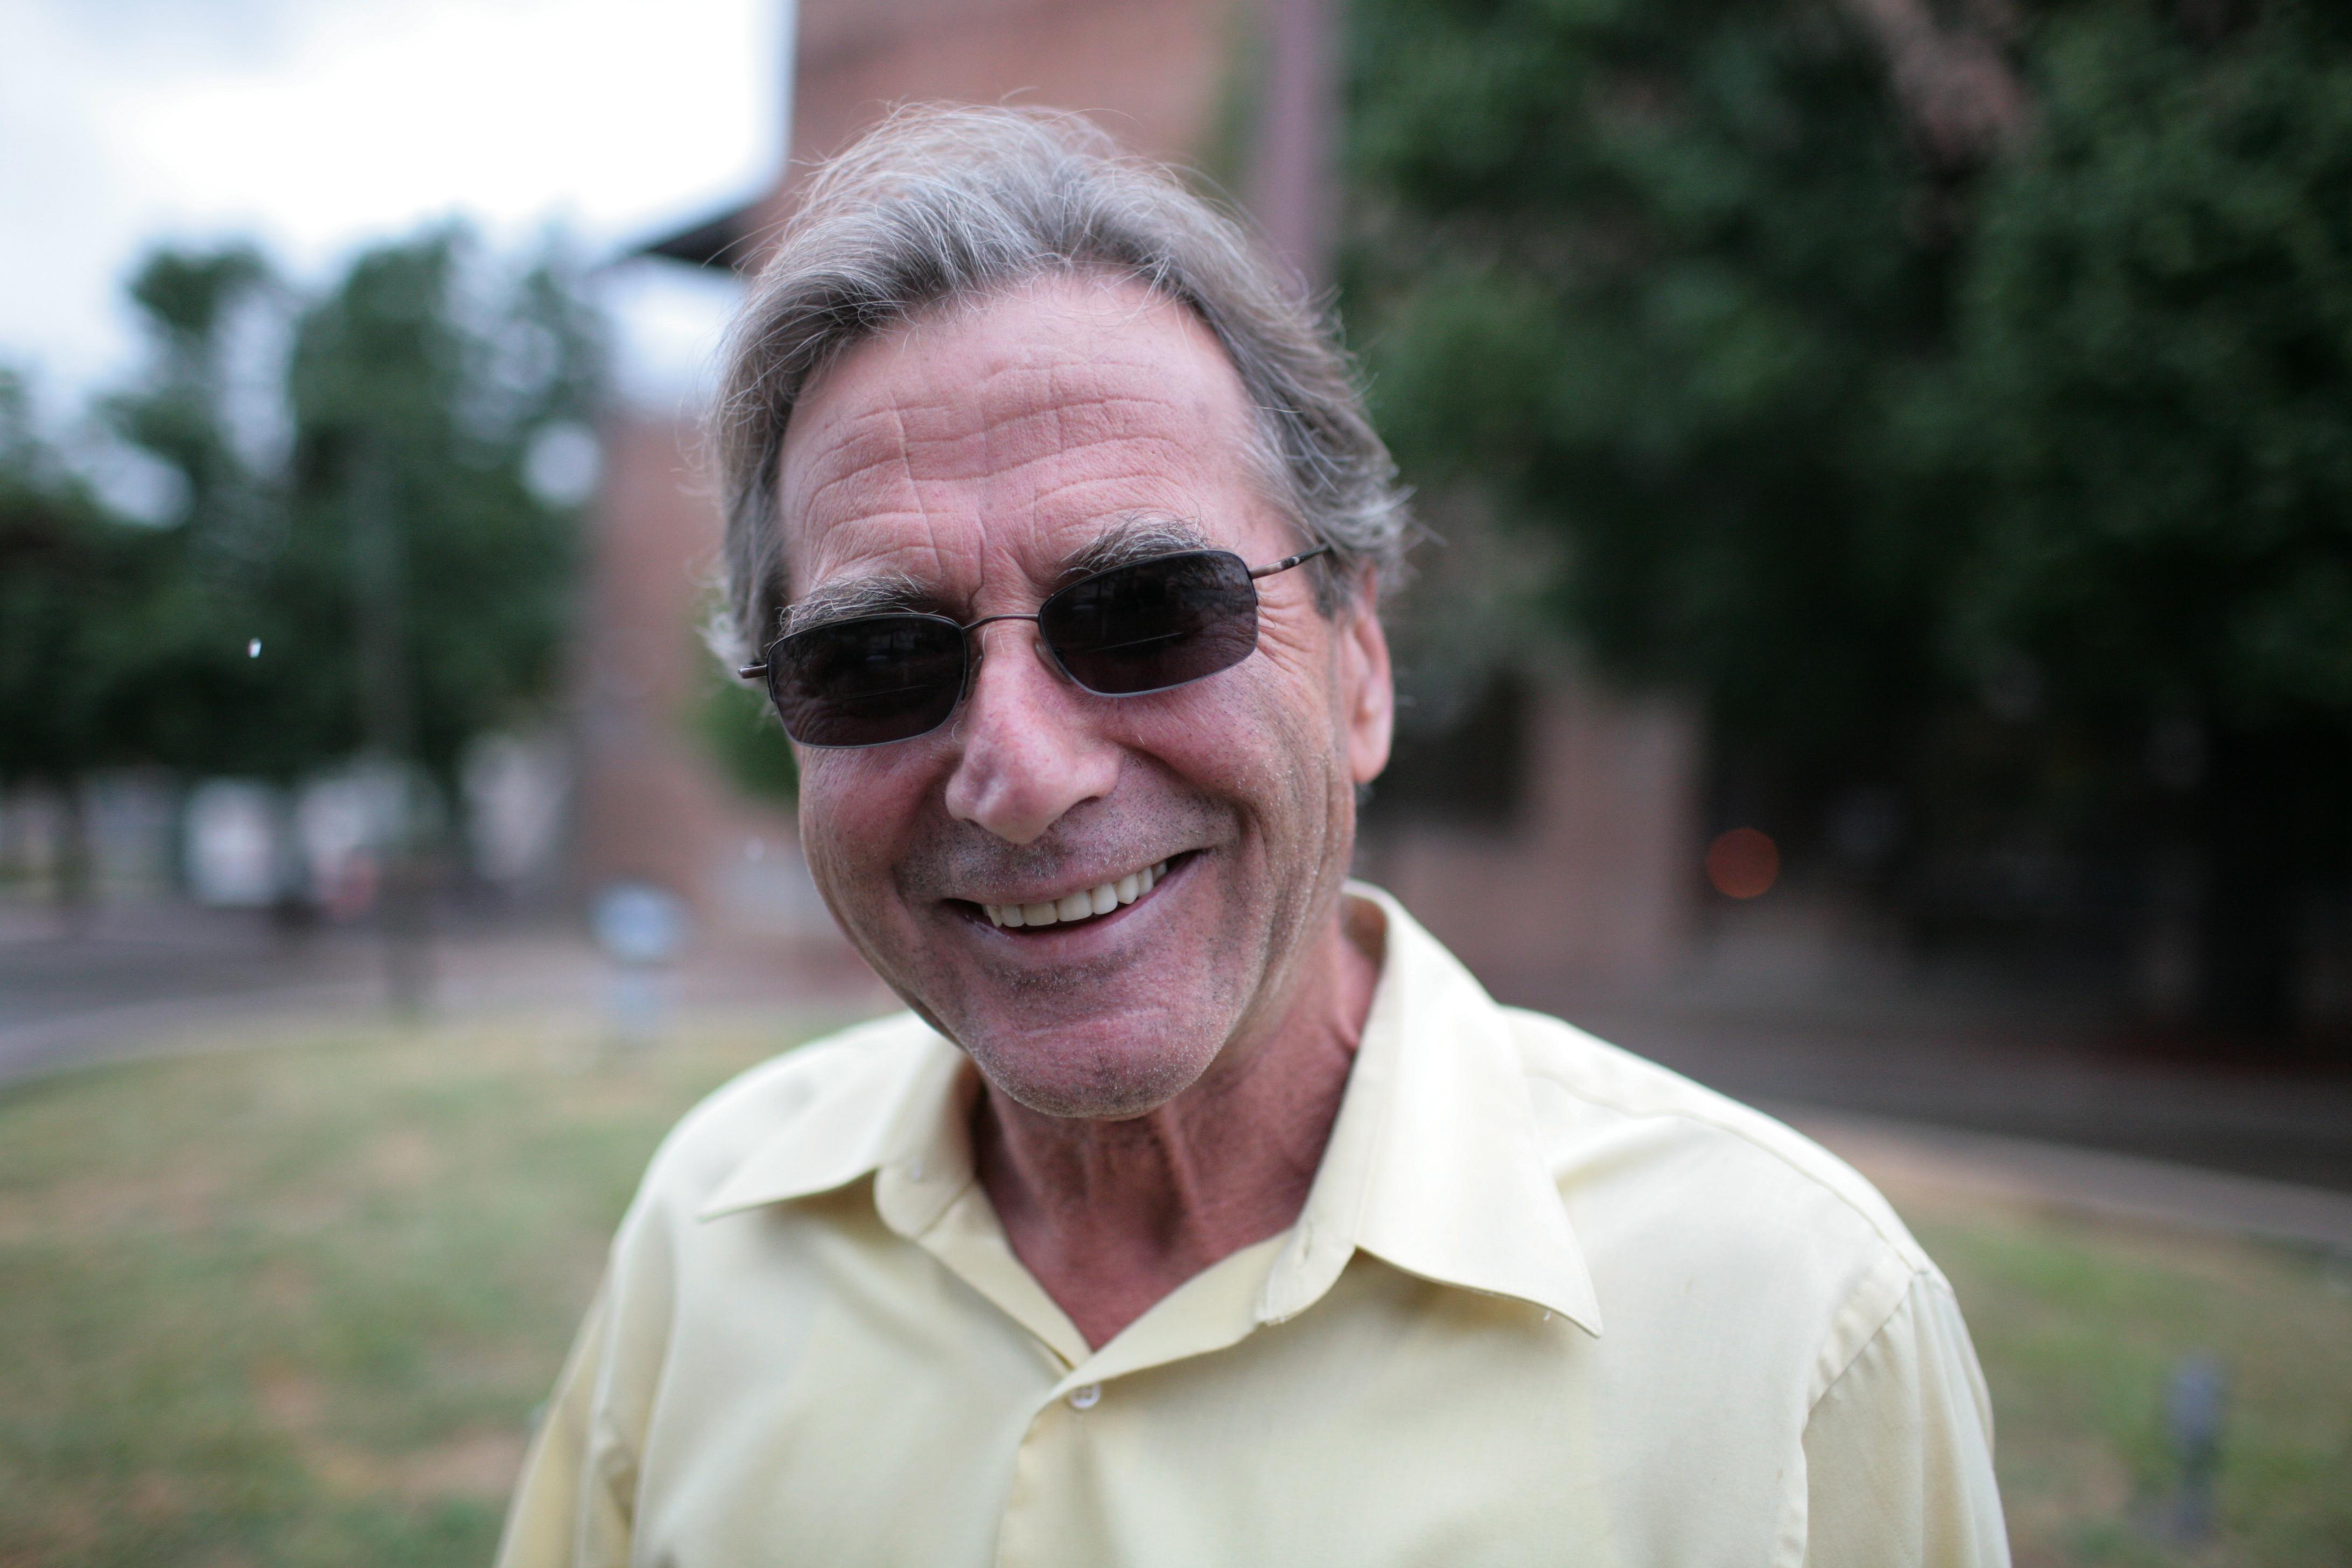 Mike Schmidt, born in Frankfurt, moved to Omaha in 1962